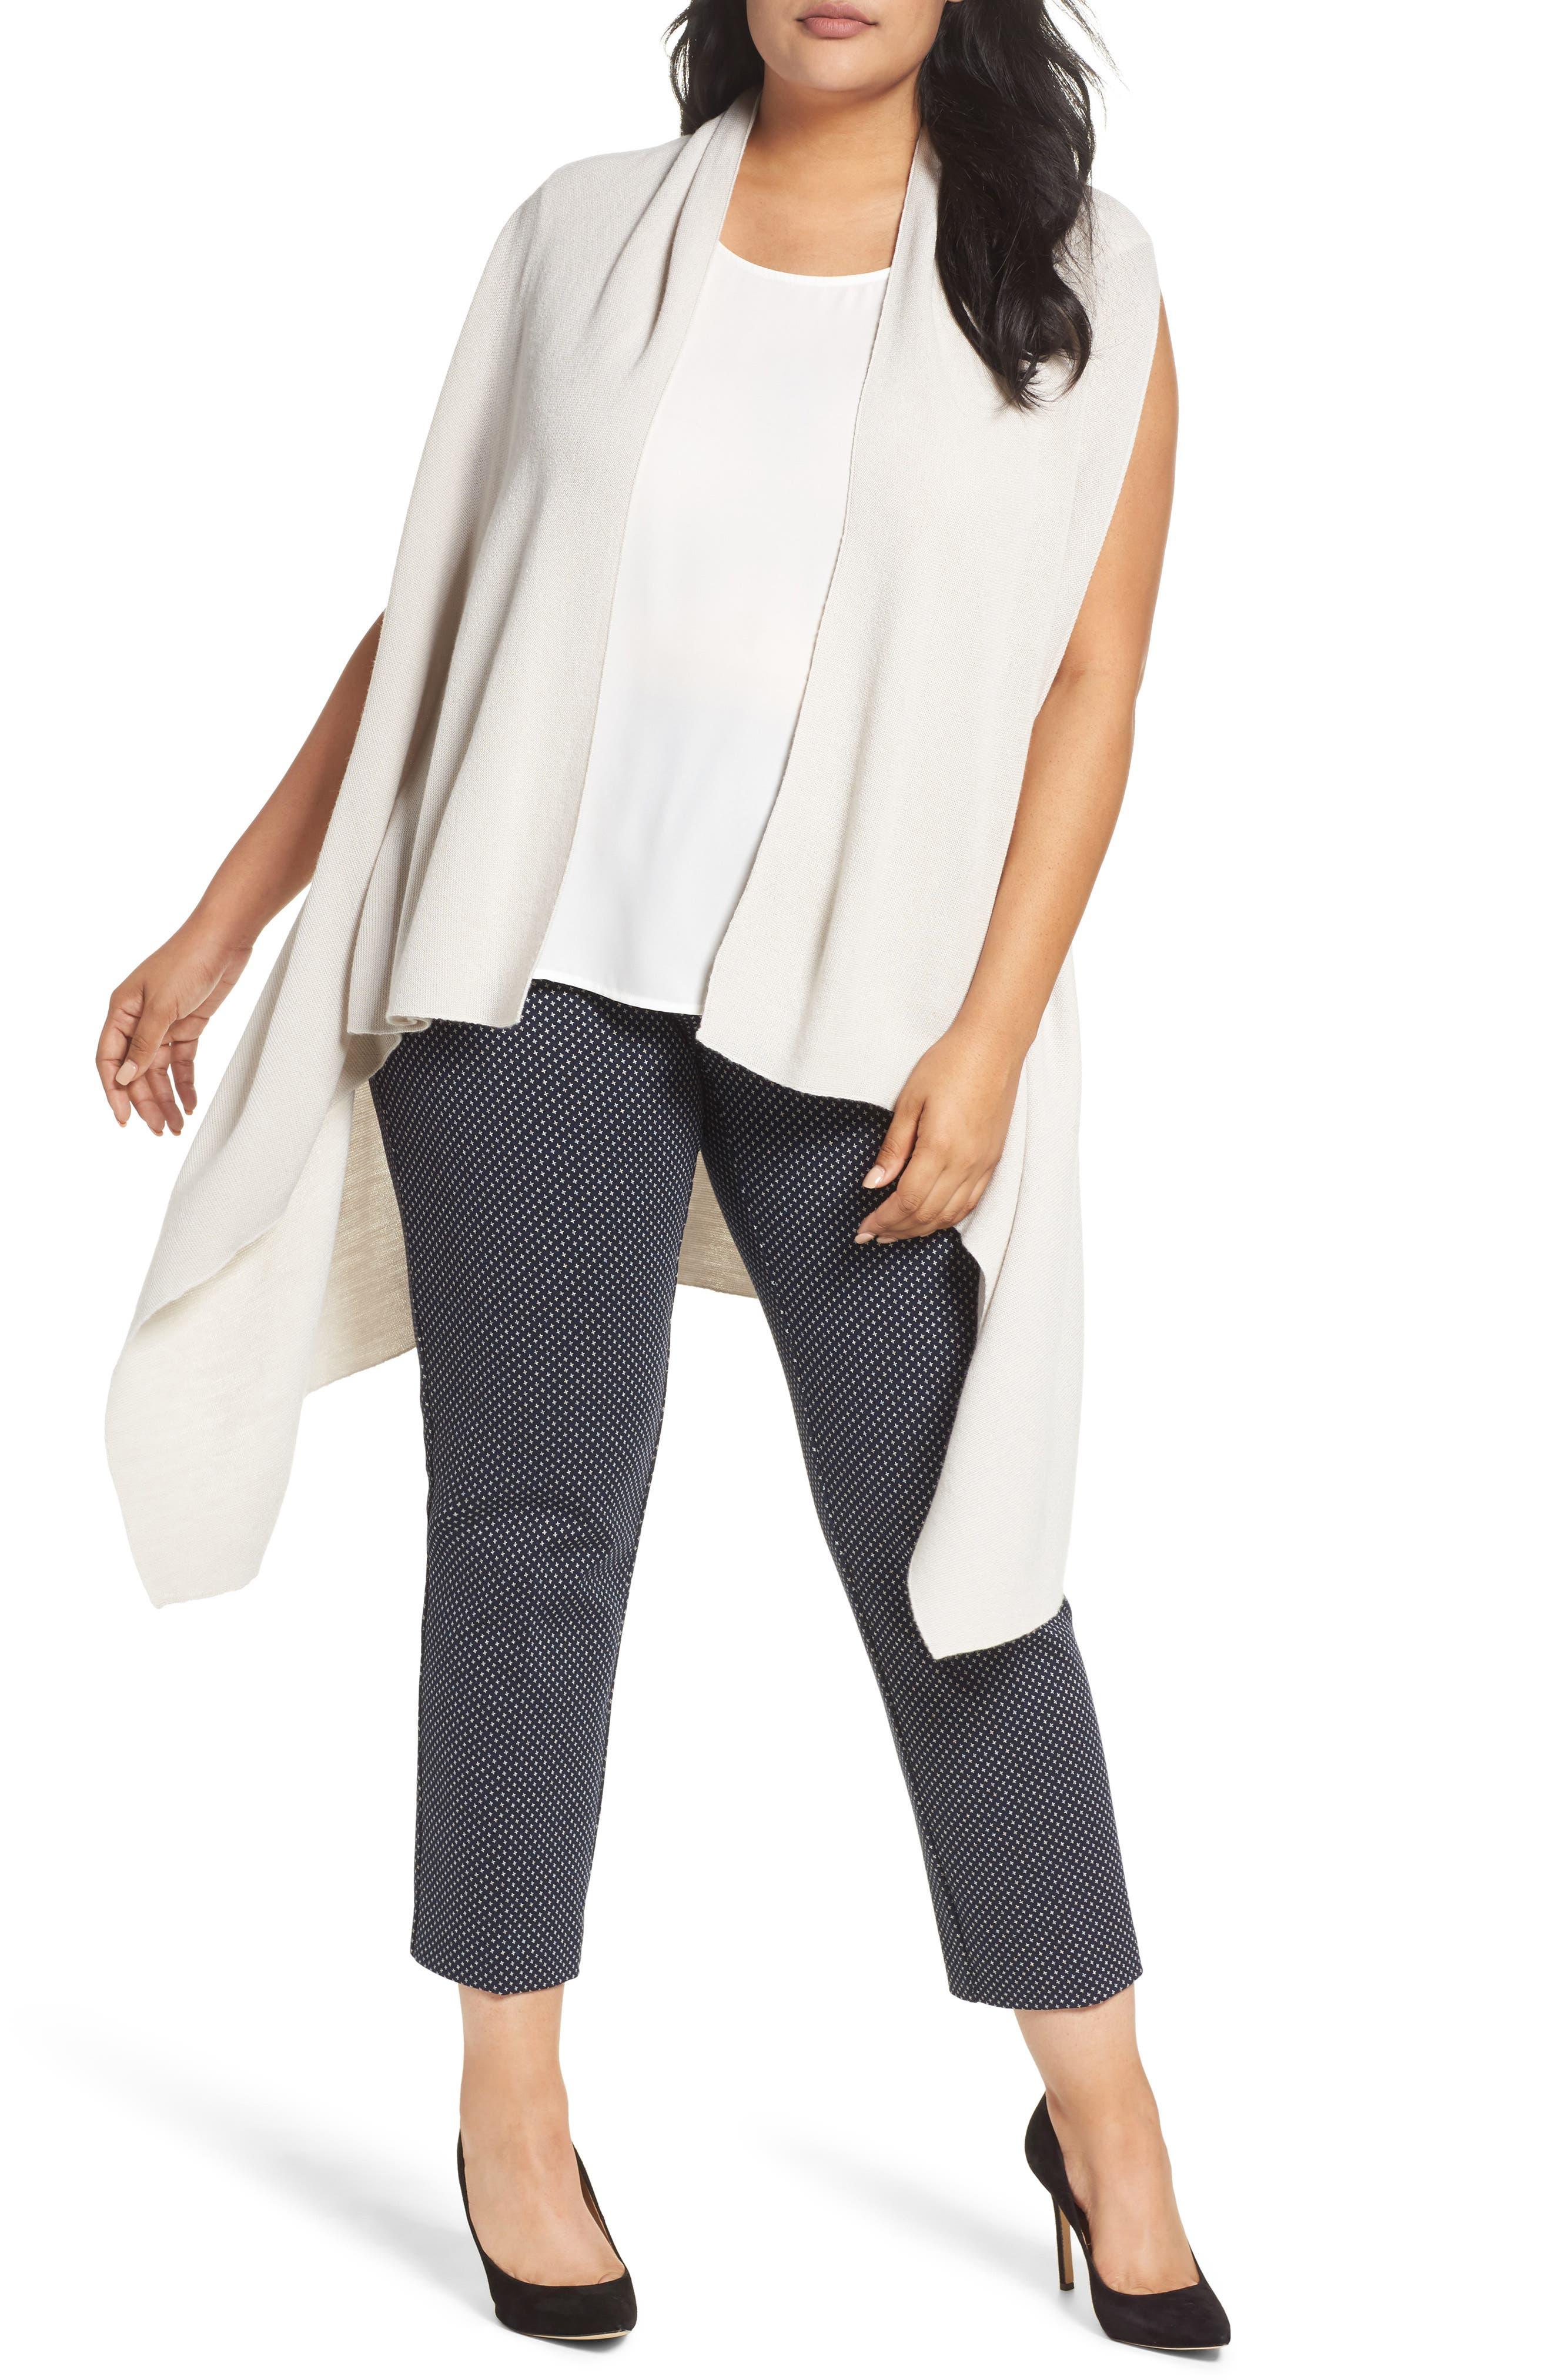 PERSONA BY MARINA RINALDI Wool Blend Knit Vest